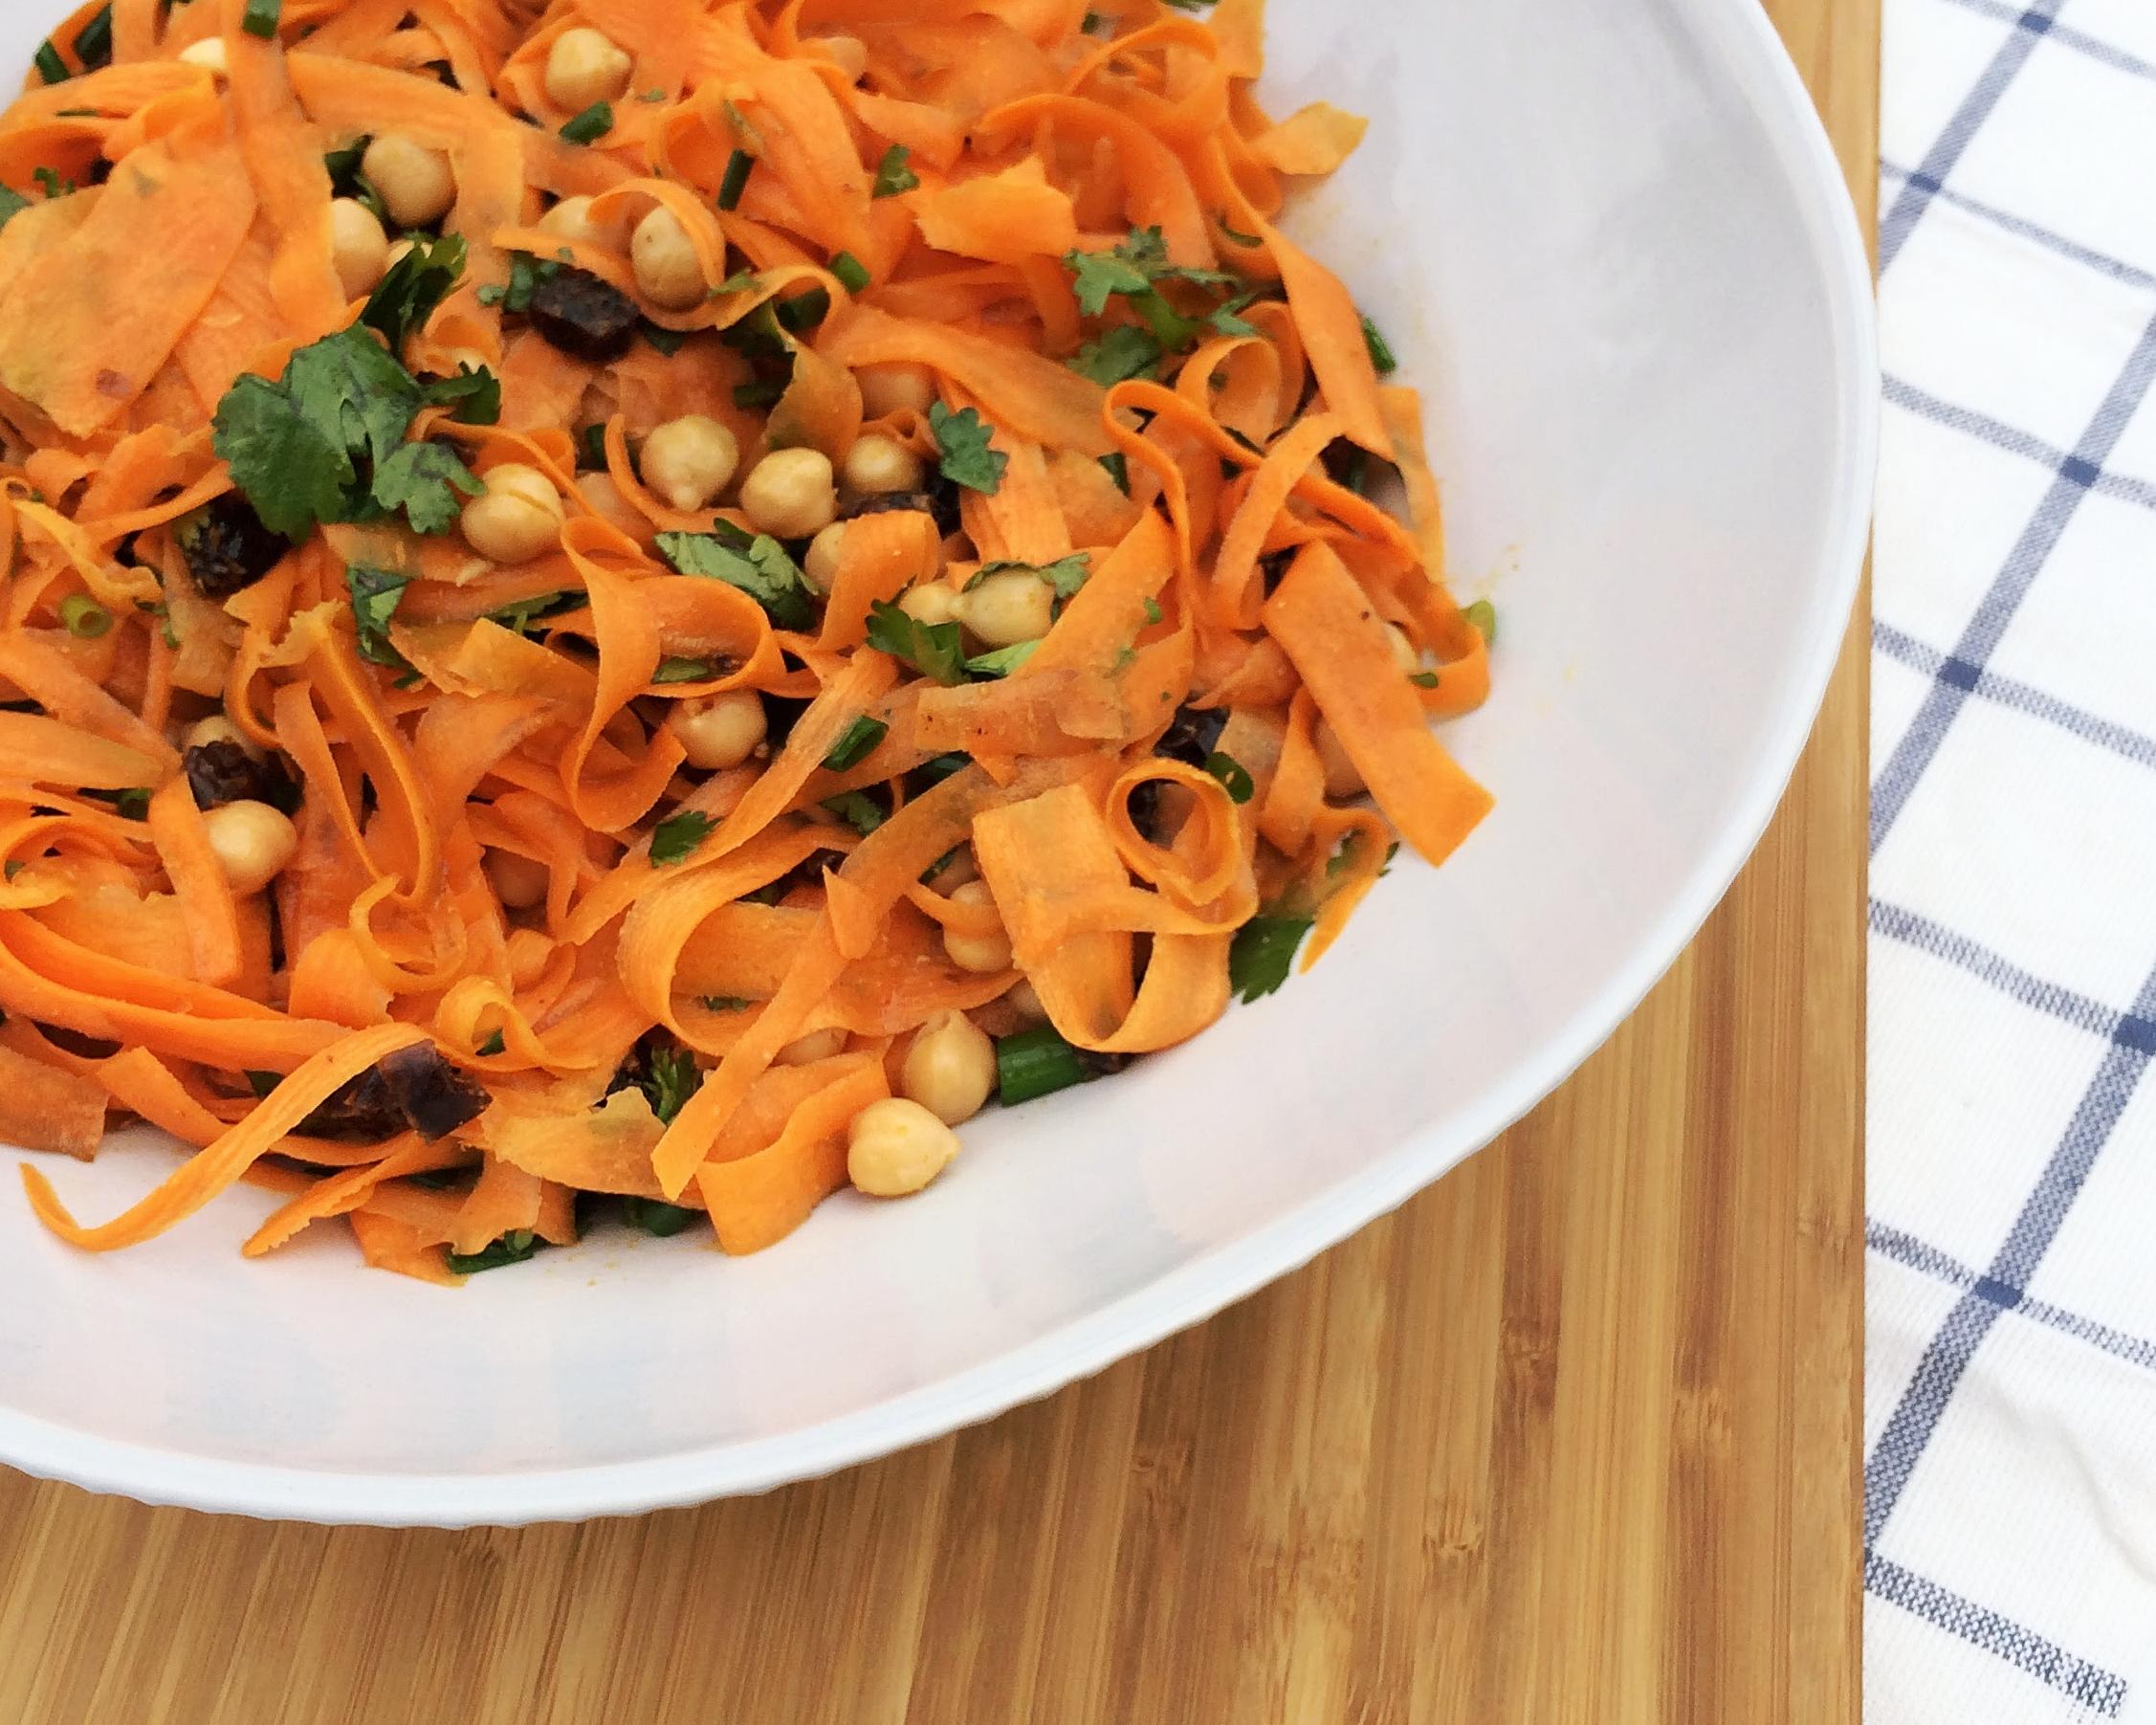 Morrocan Carrot Salad